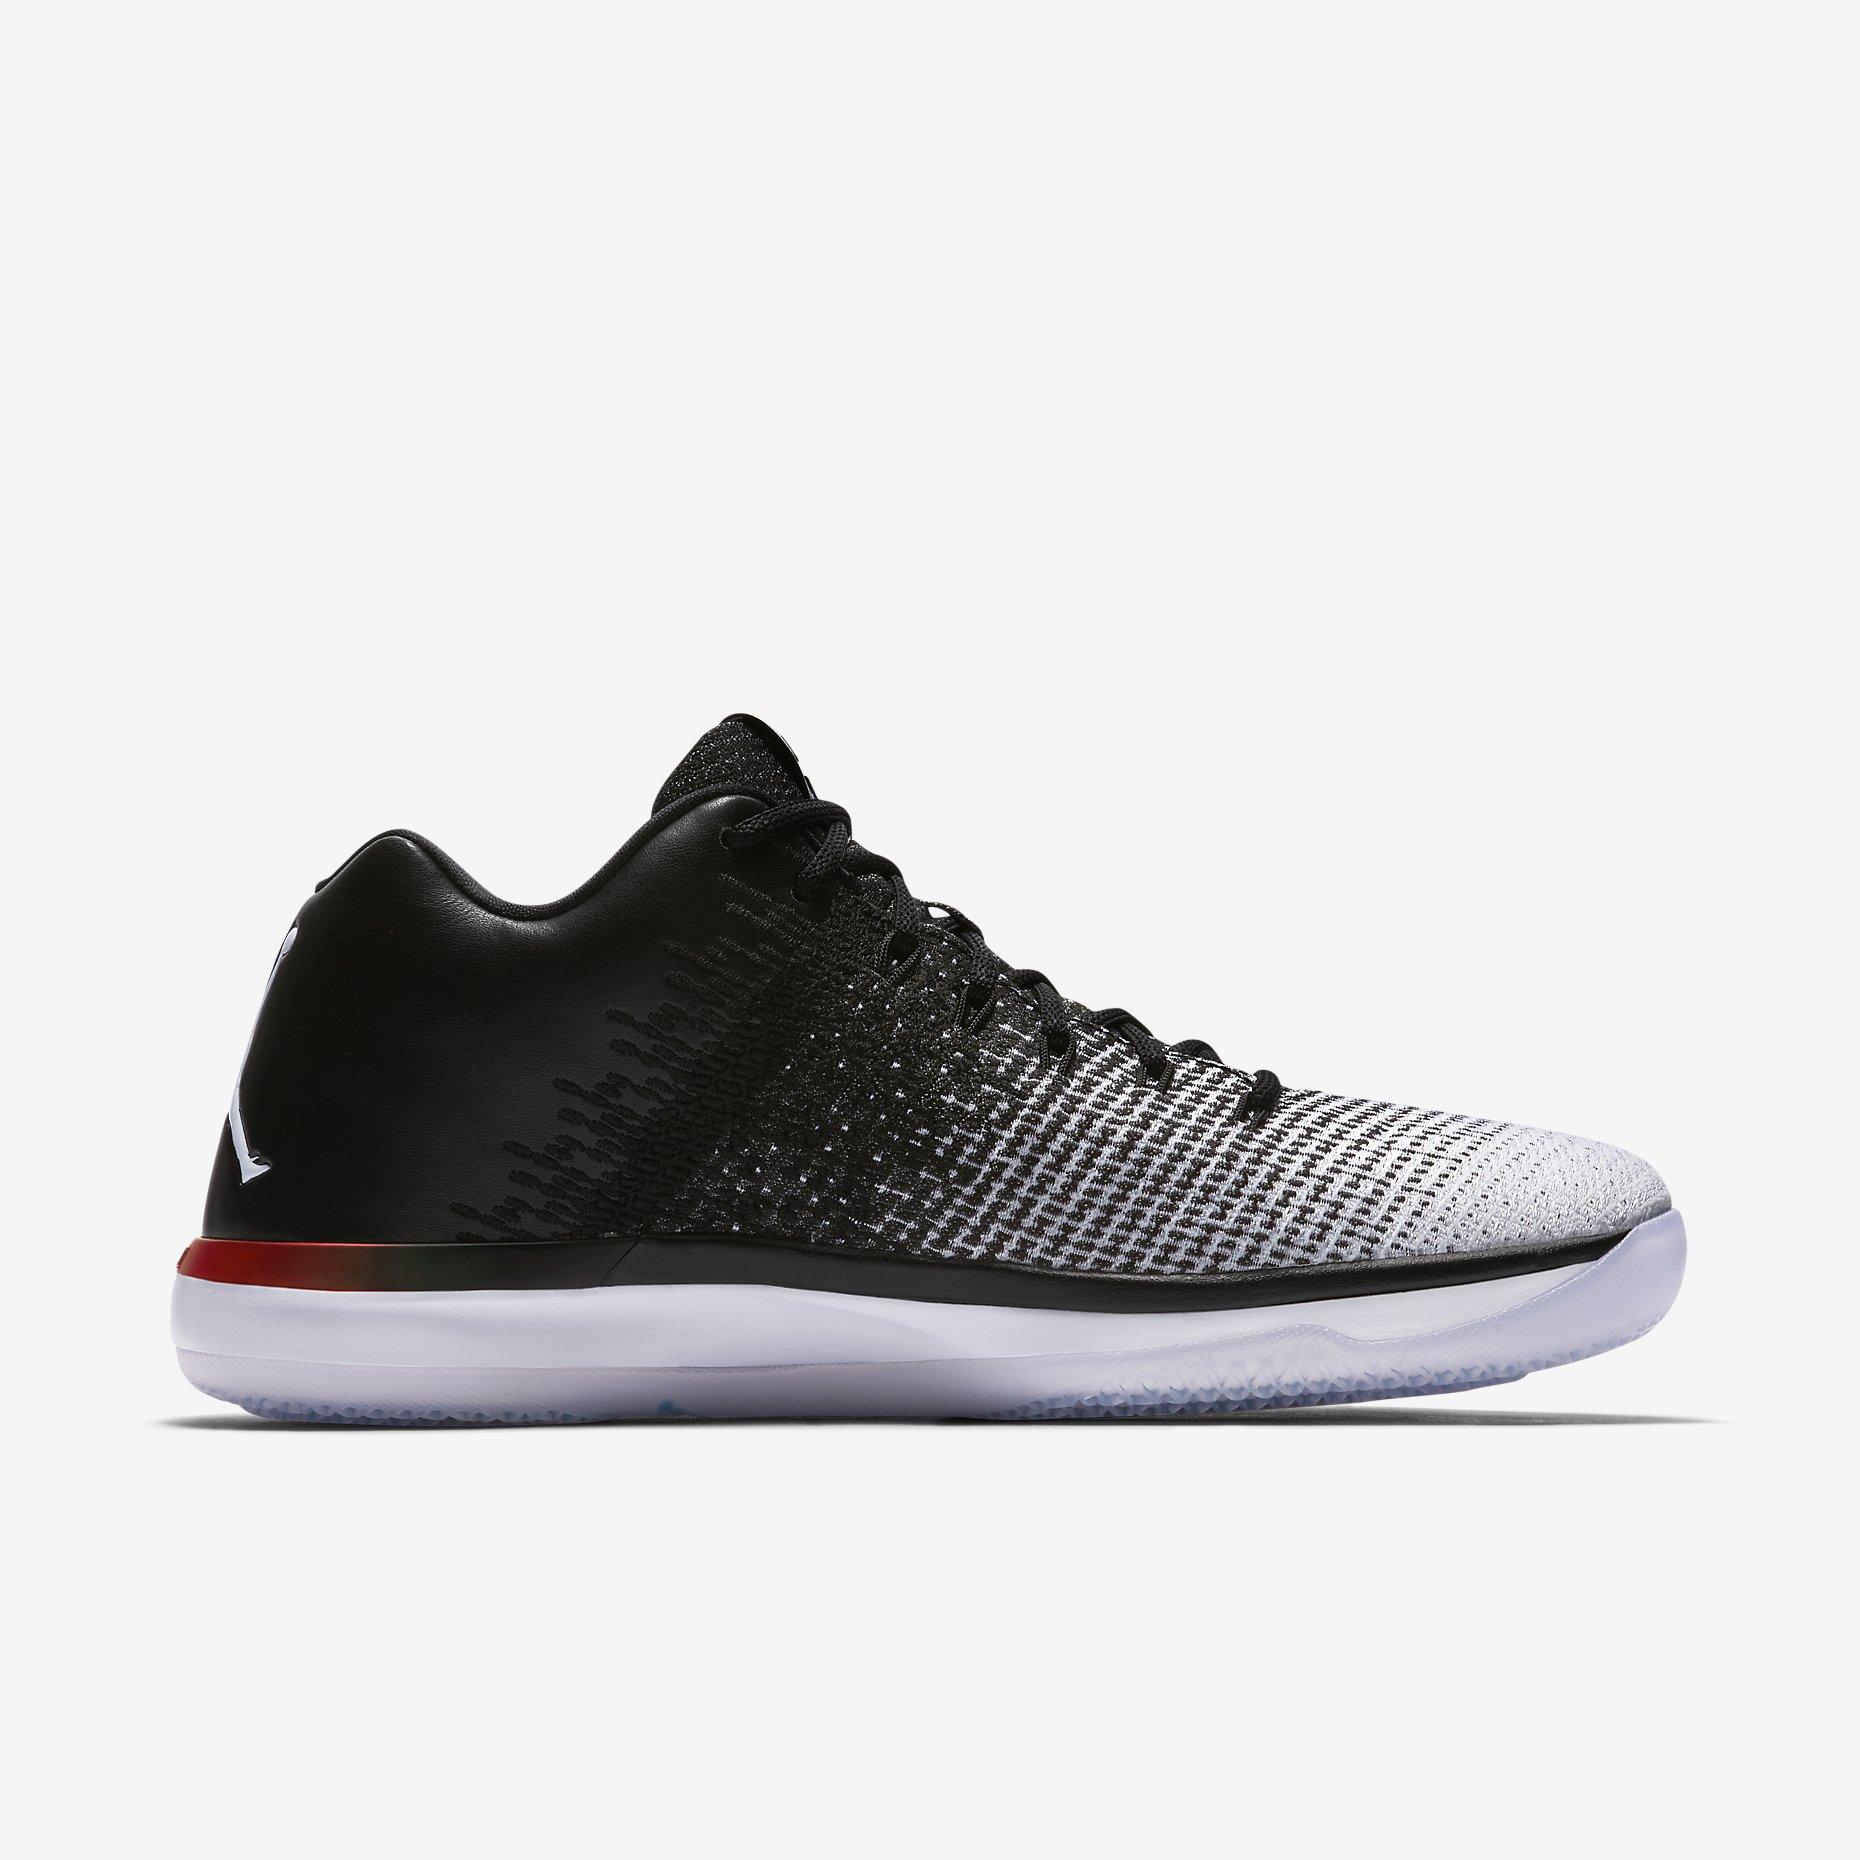 info for 09591 ea01e Nike - Air Jordan XXXI Low Q54 - 3